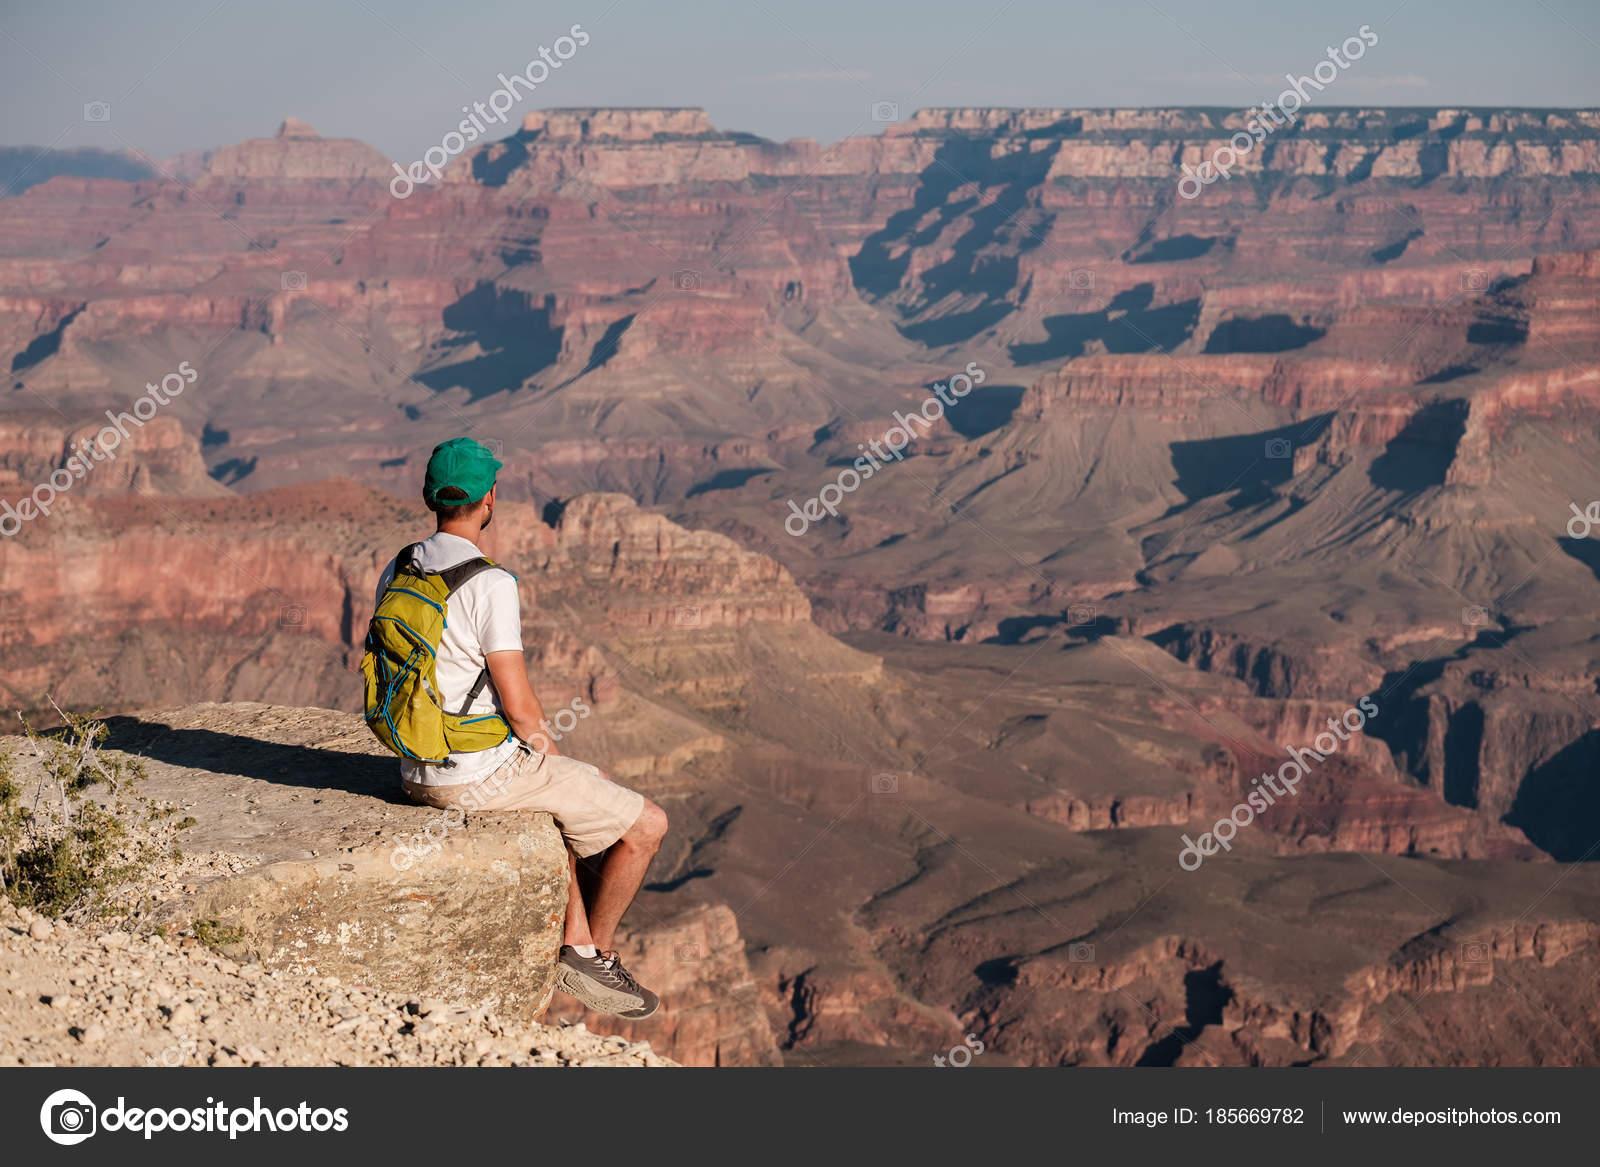 Canyon Assis Dos Sur Touristique Avec Grand Sac Bord Rocher sdhQxtrC